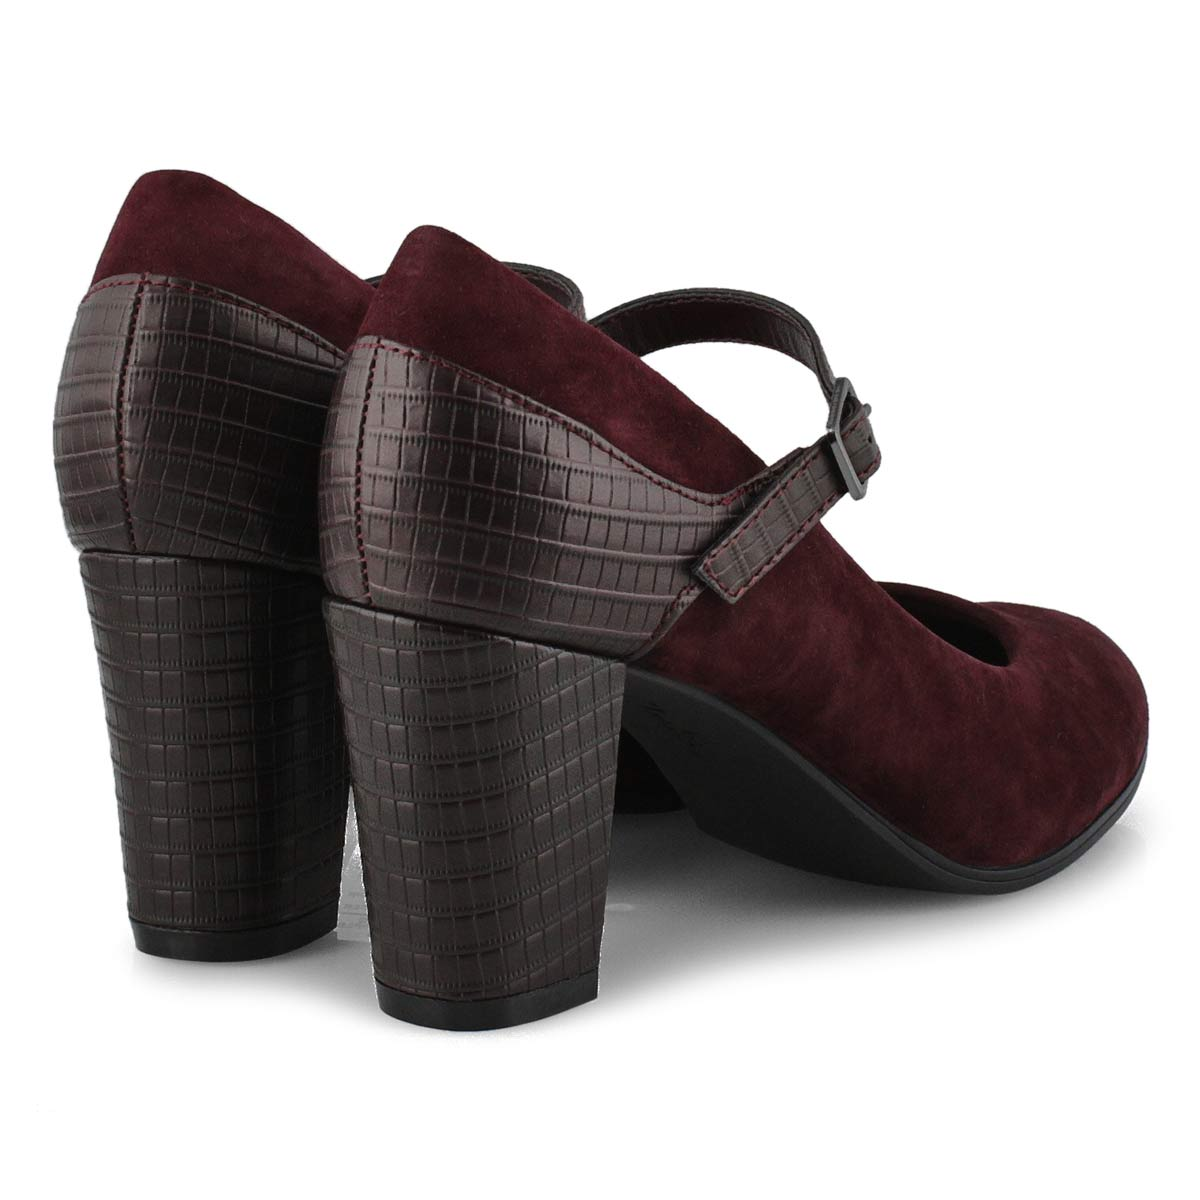 Women's Alayna Shine Dress Shoe - Burgandy